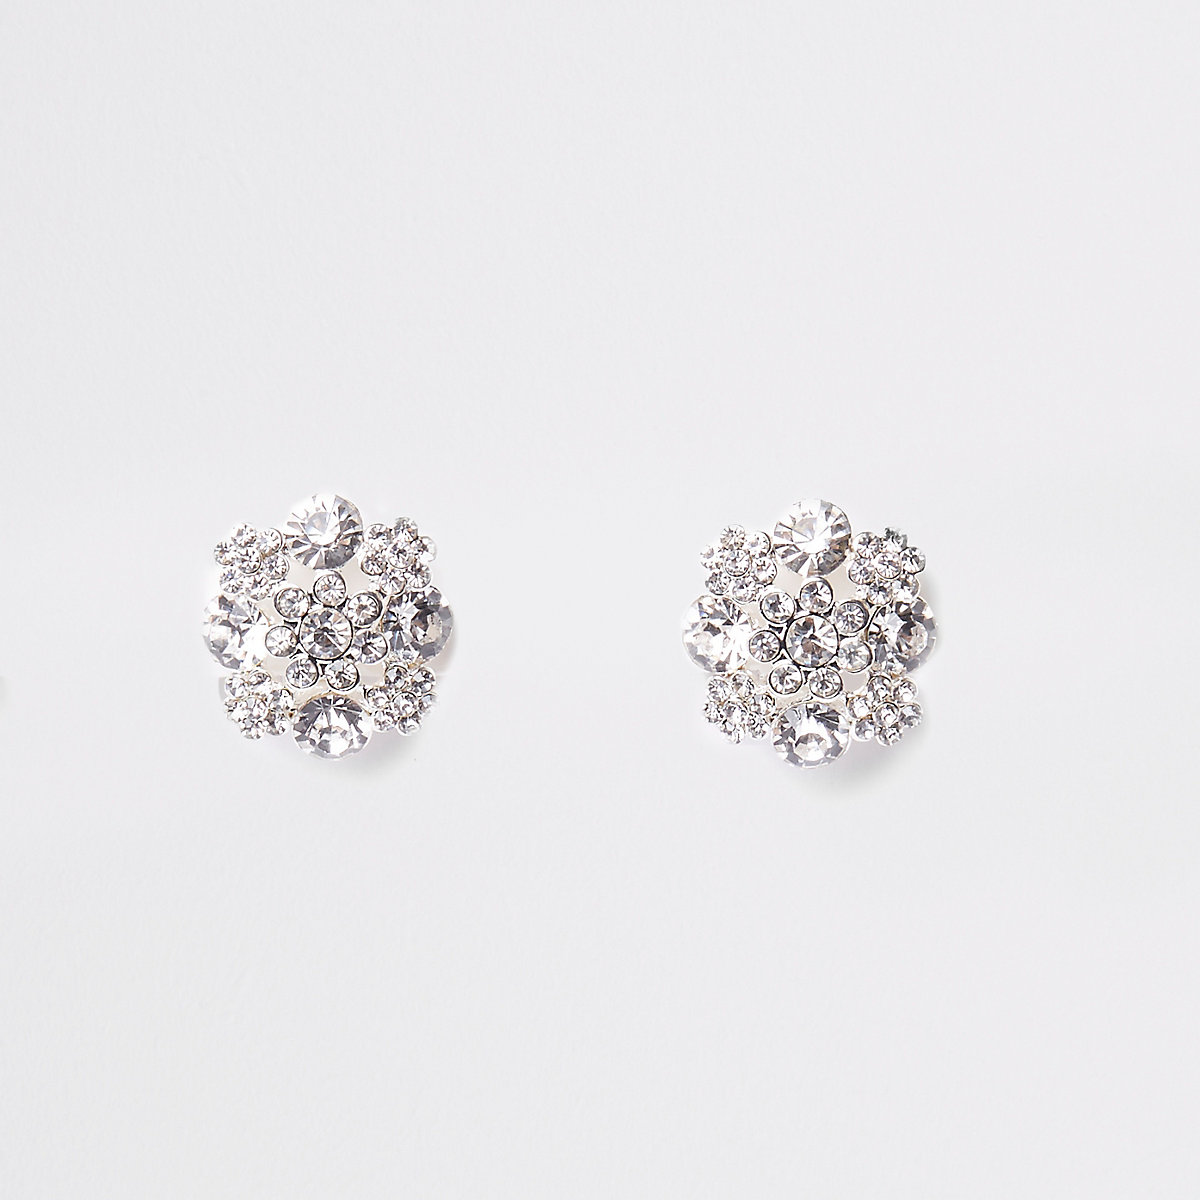 White rhinestone clip on earrings